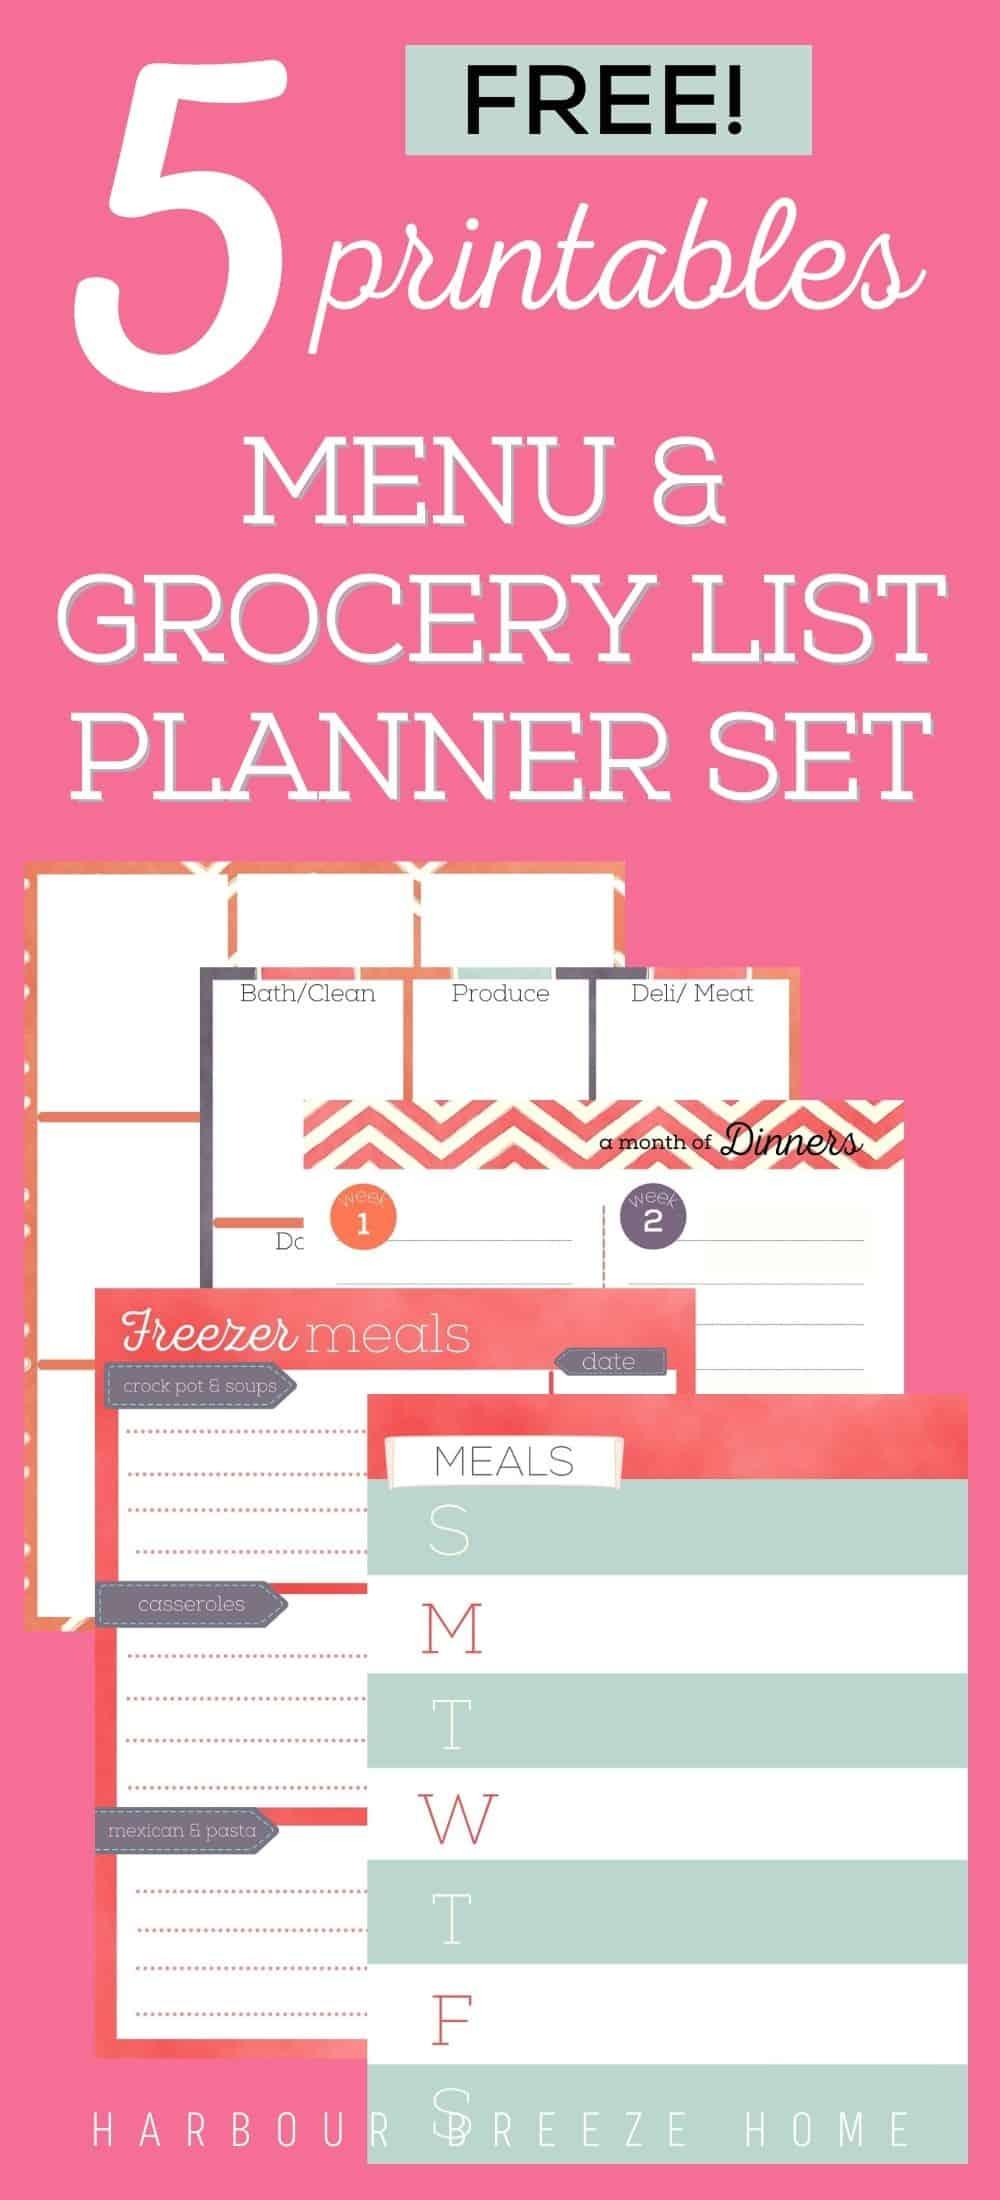 Free printable grocery lists and menu plans